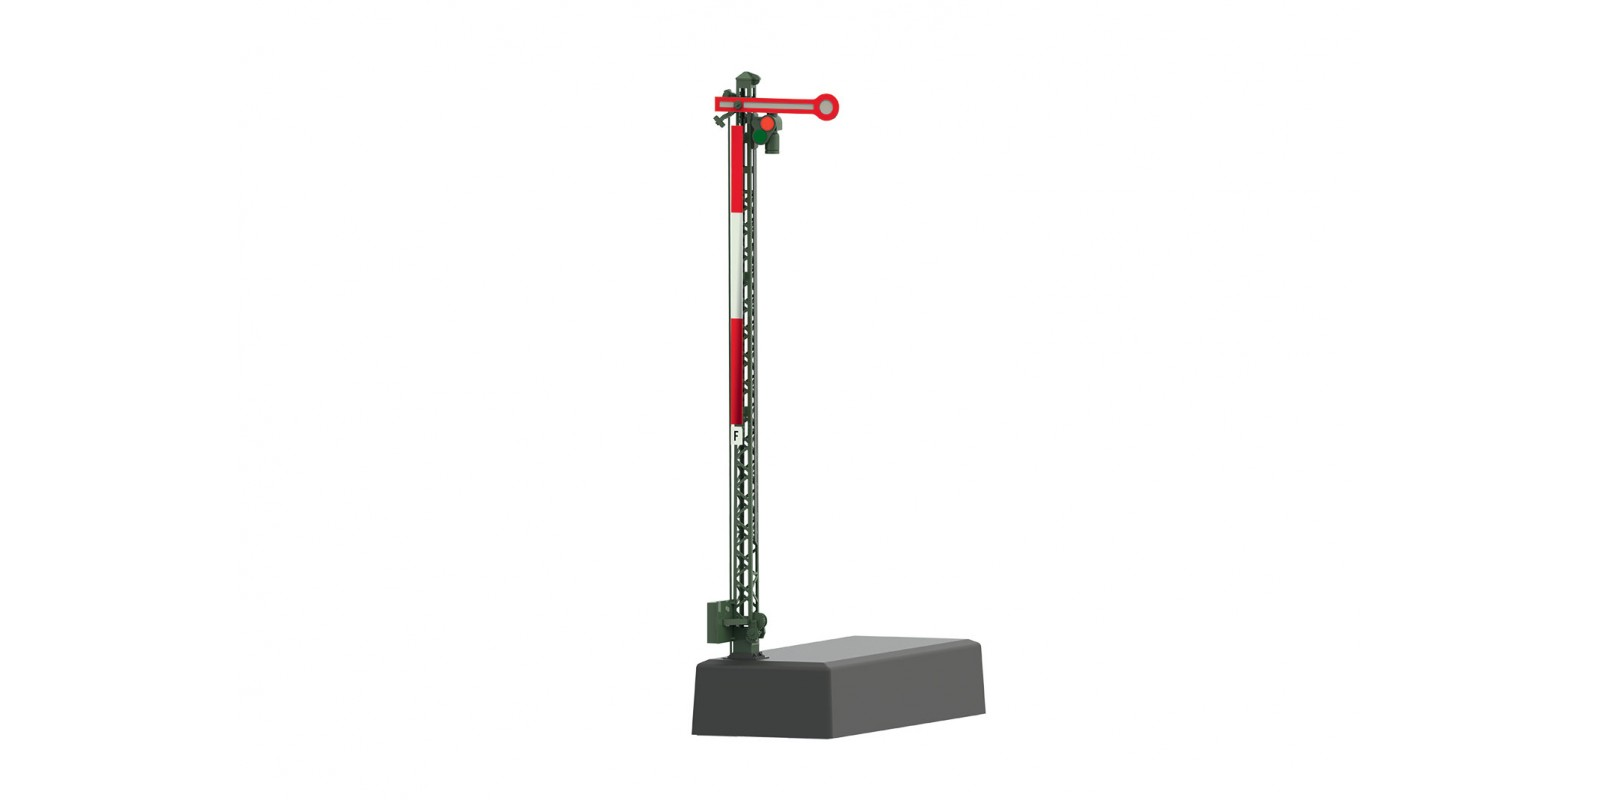 70392 Home Signal with a Lattice Mast